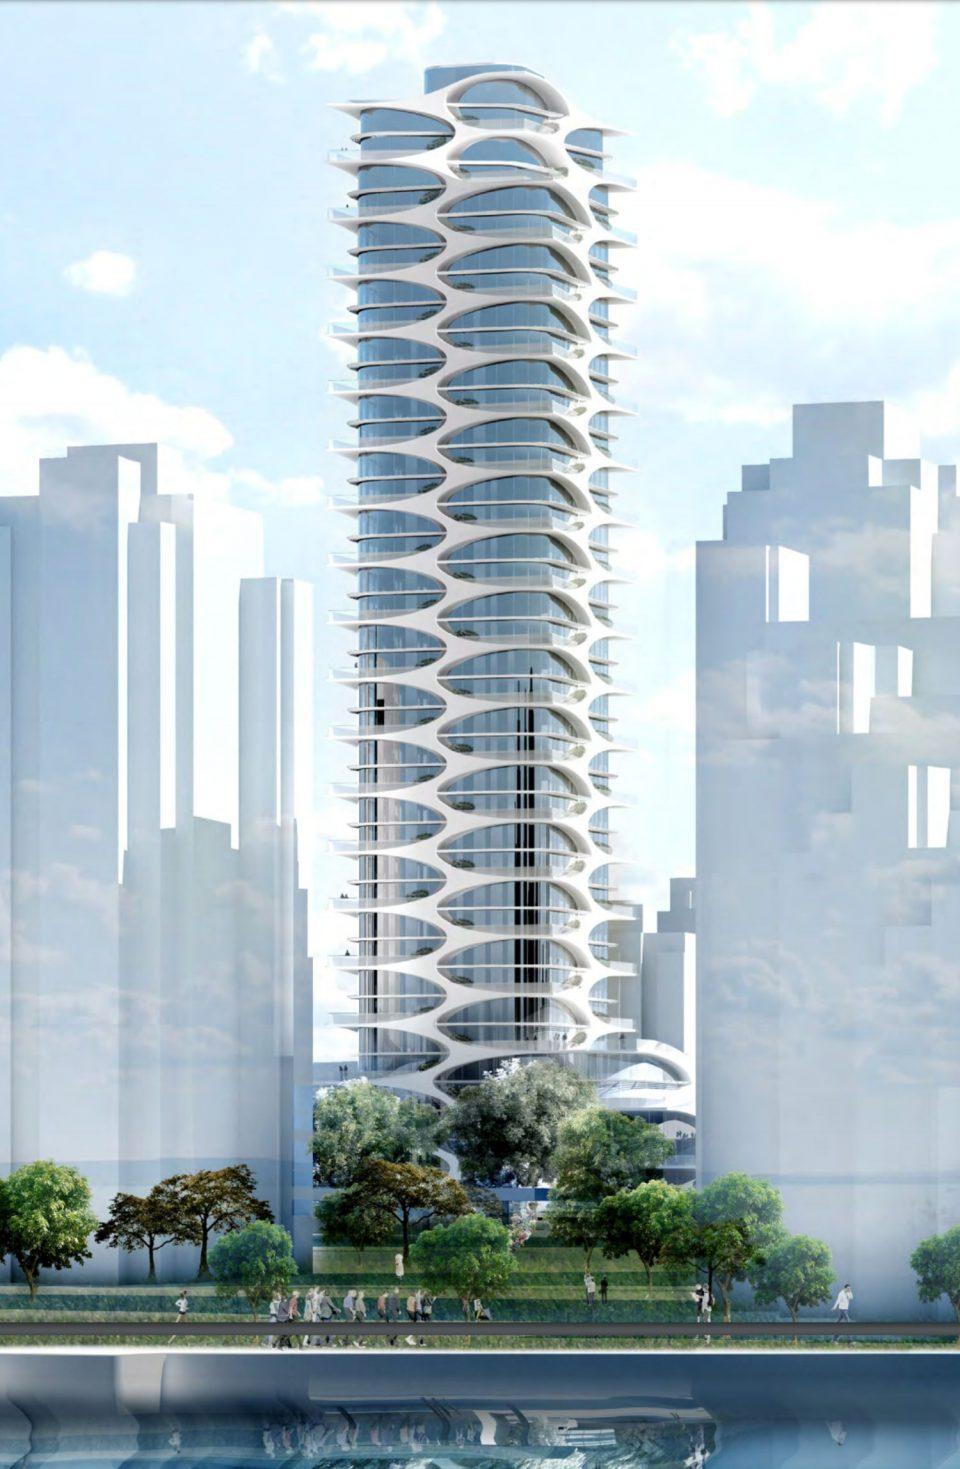 Westbank plans 39-storey Bing Thom tower for 1600-block Alberni